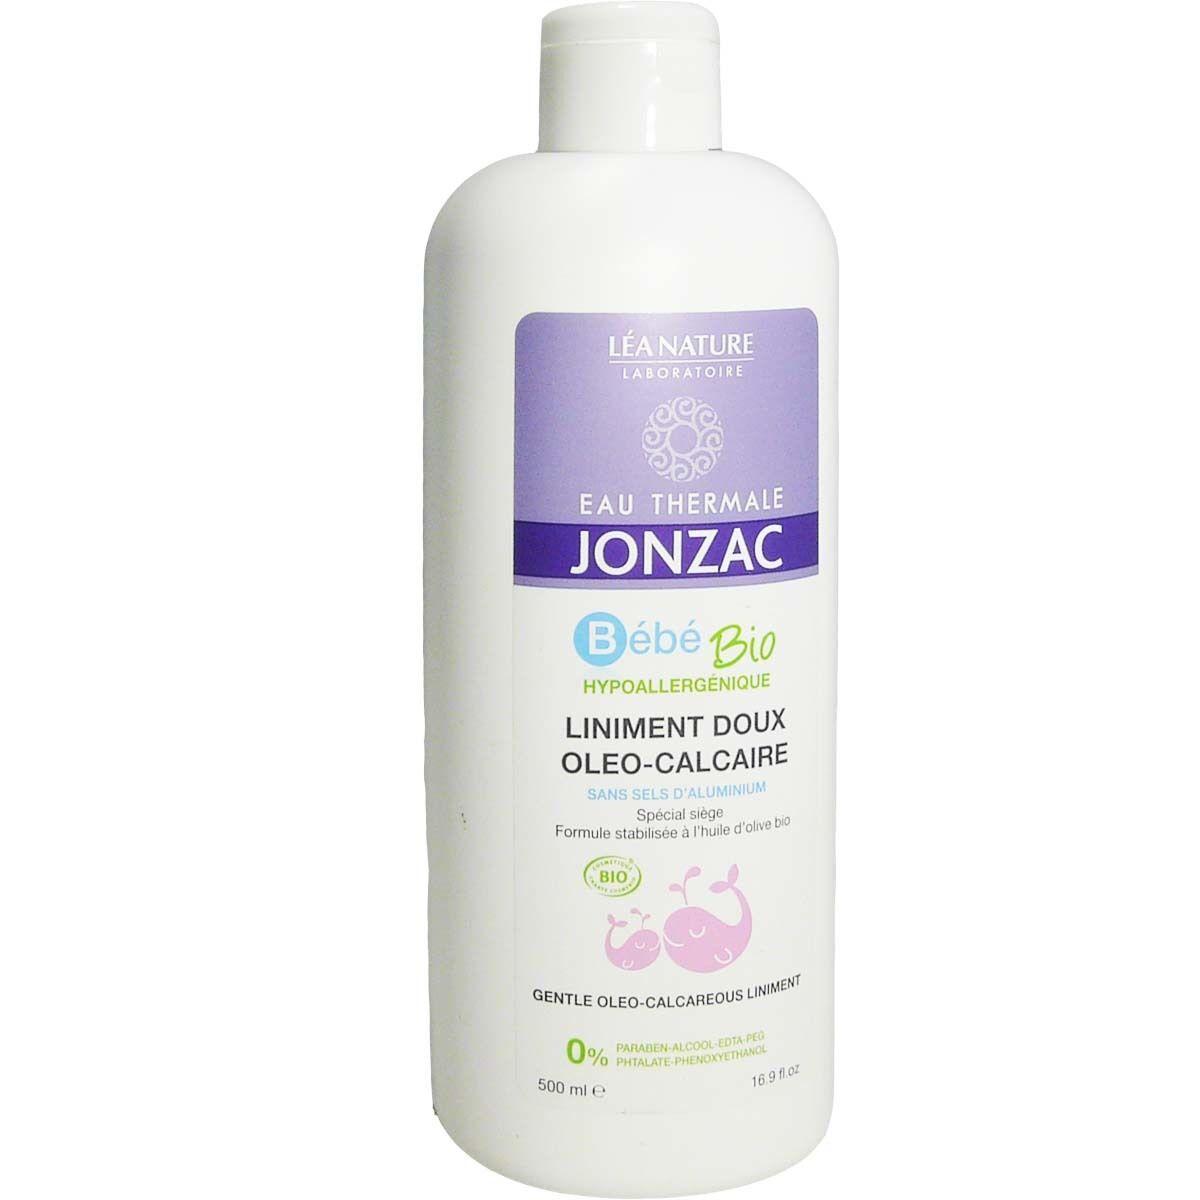 Jonzac bebe bio liniment doux oleo-calcaire 500ml